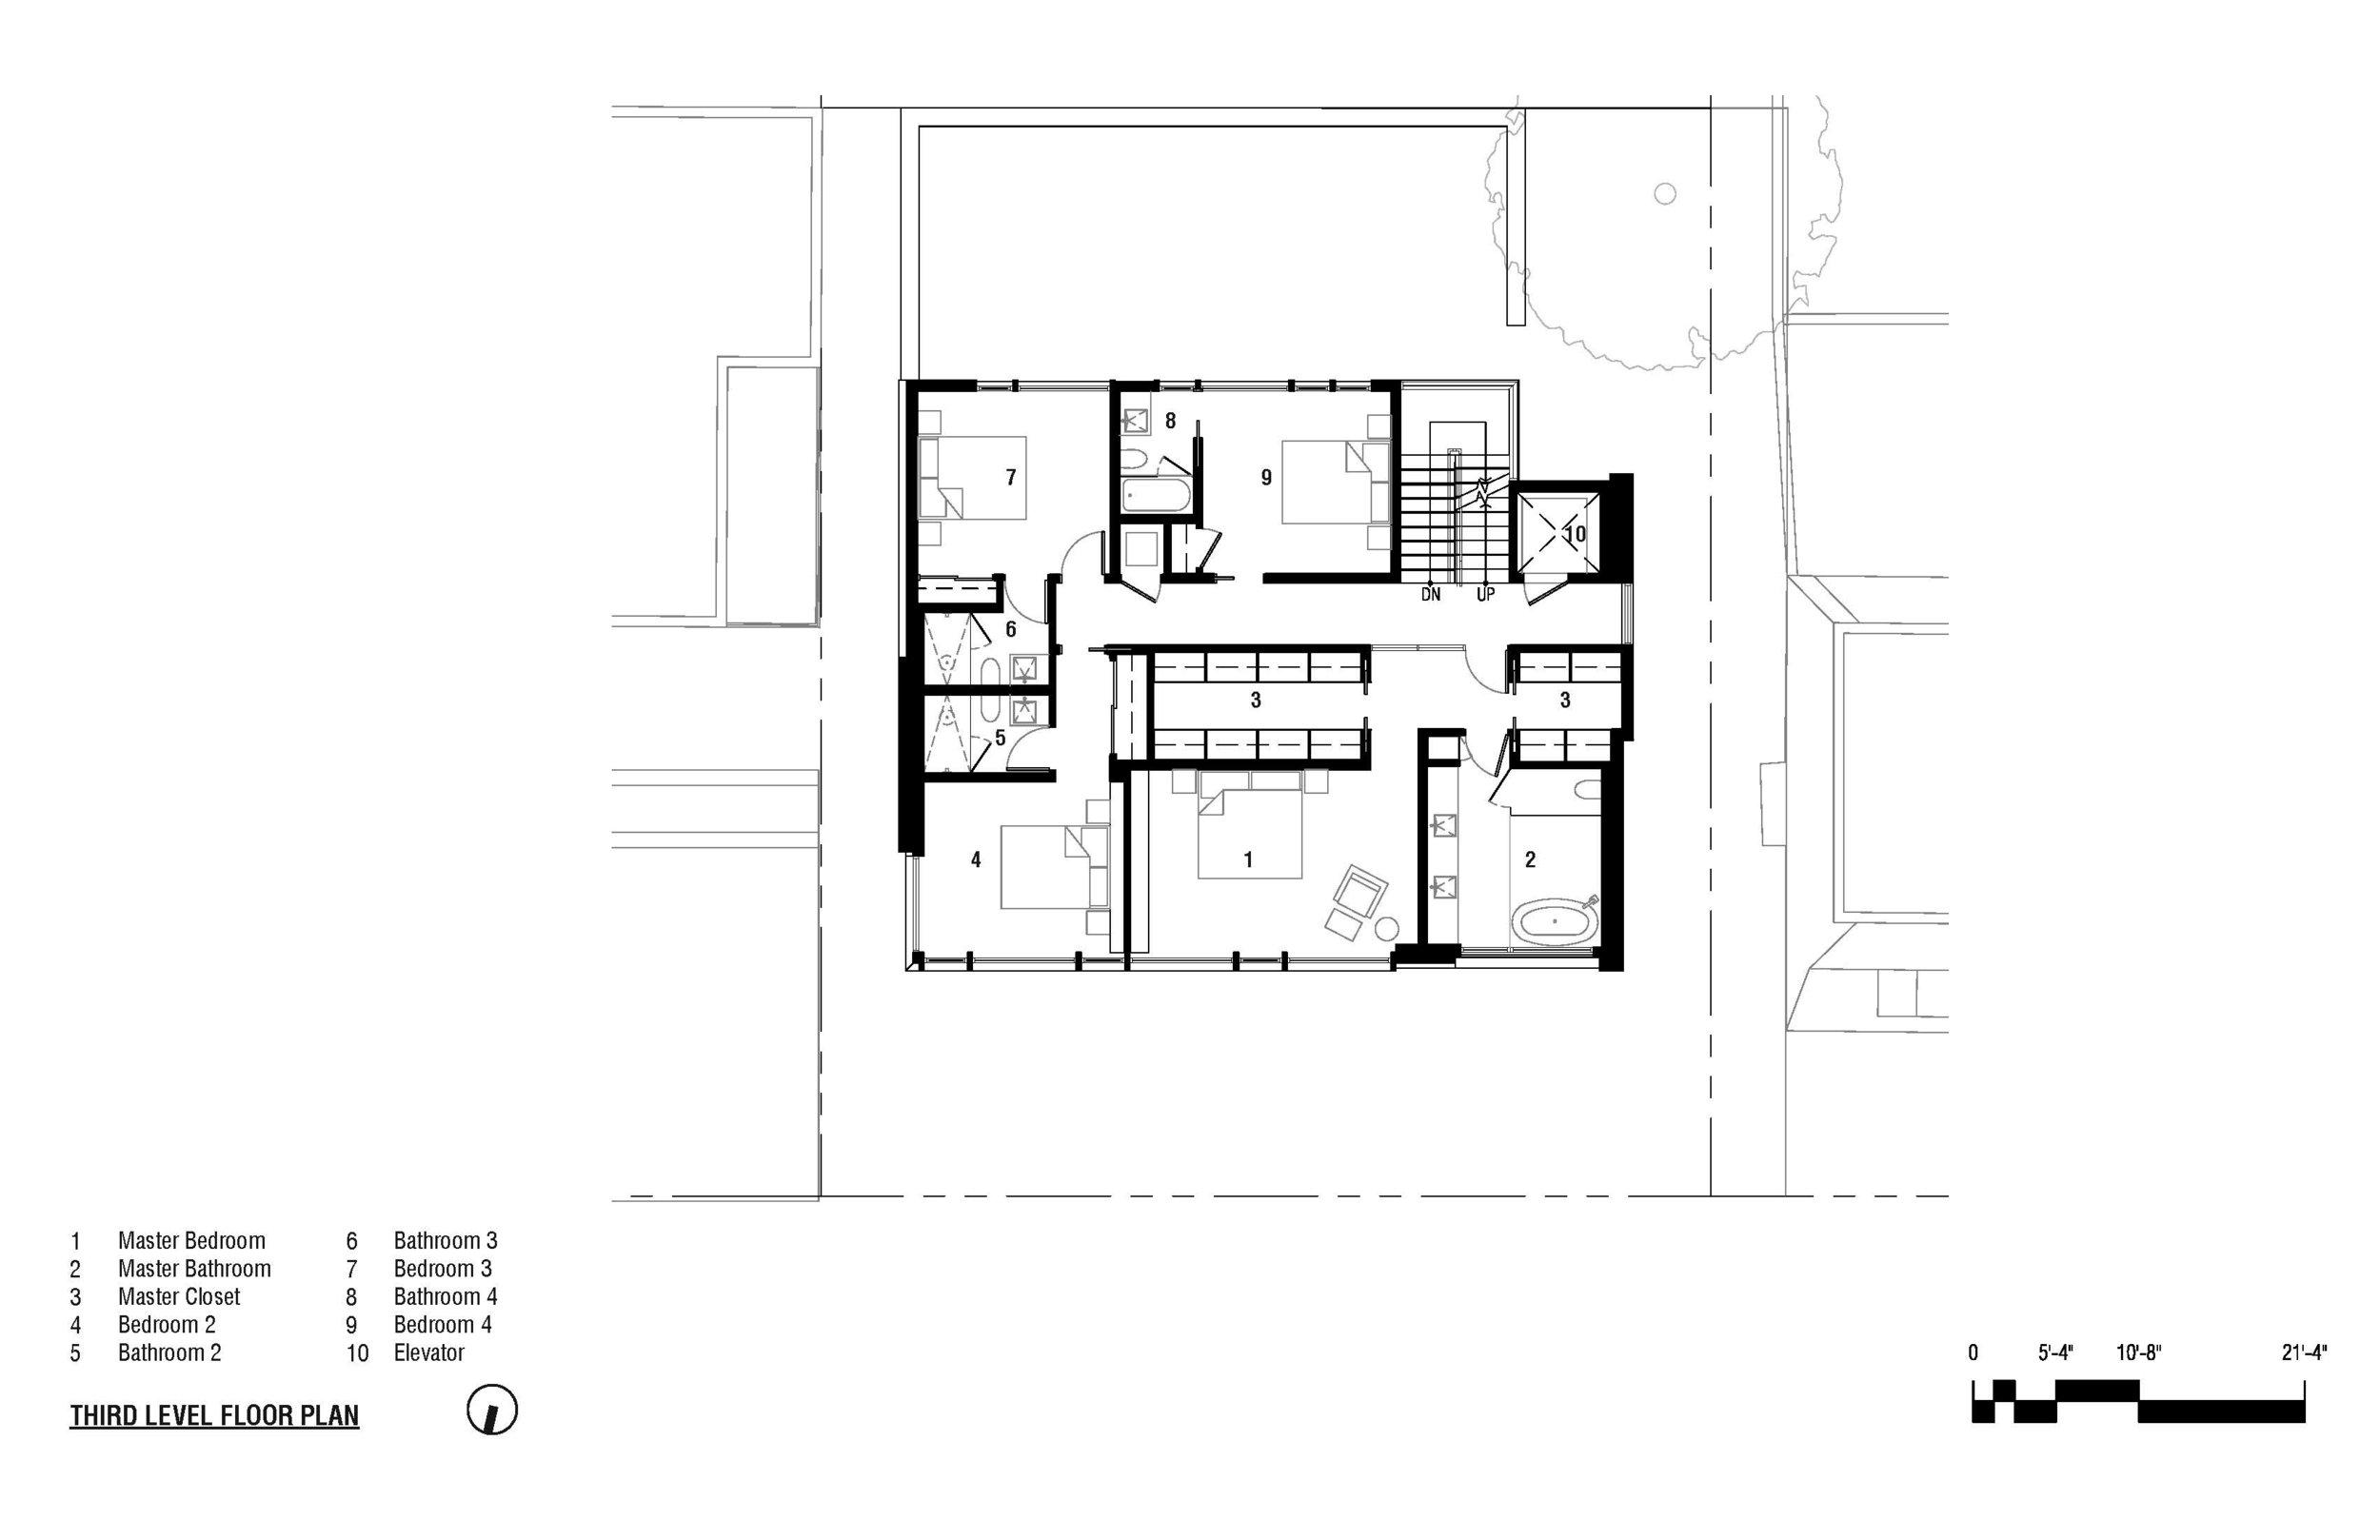 2018-0517 Vallejo- Floor Plan Layouts (1)_Page_4.jpg